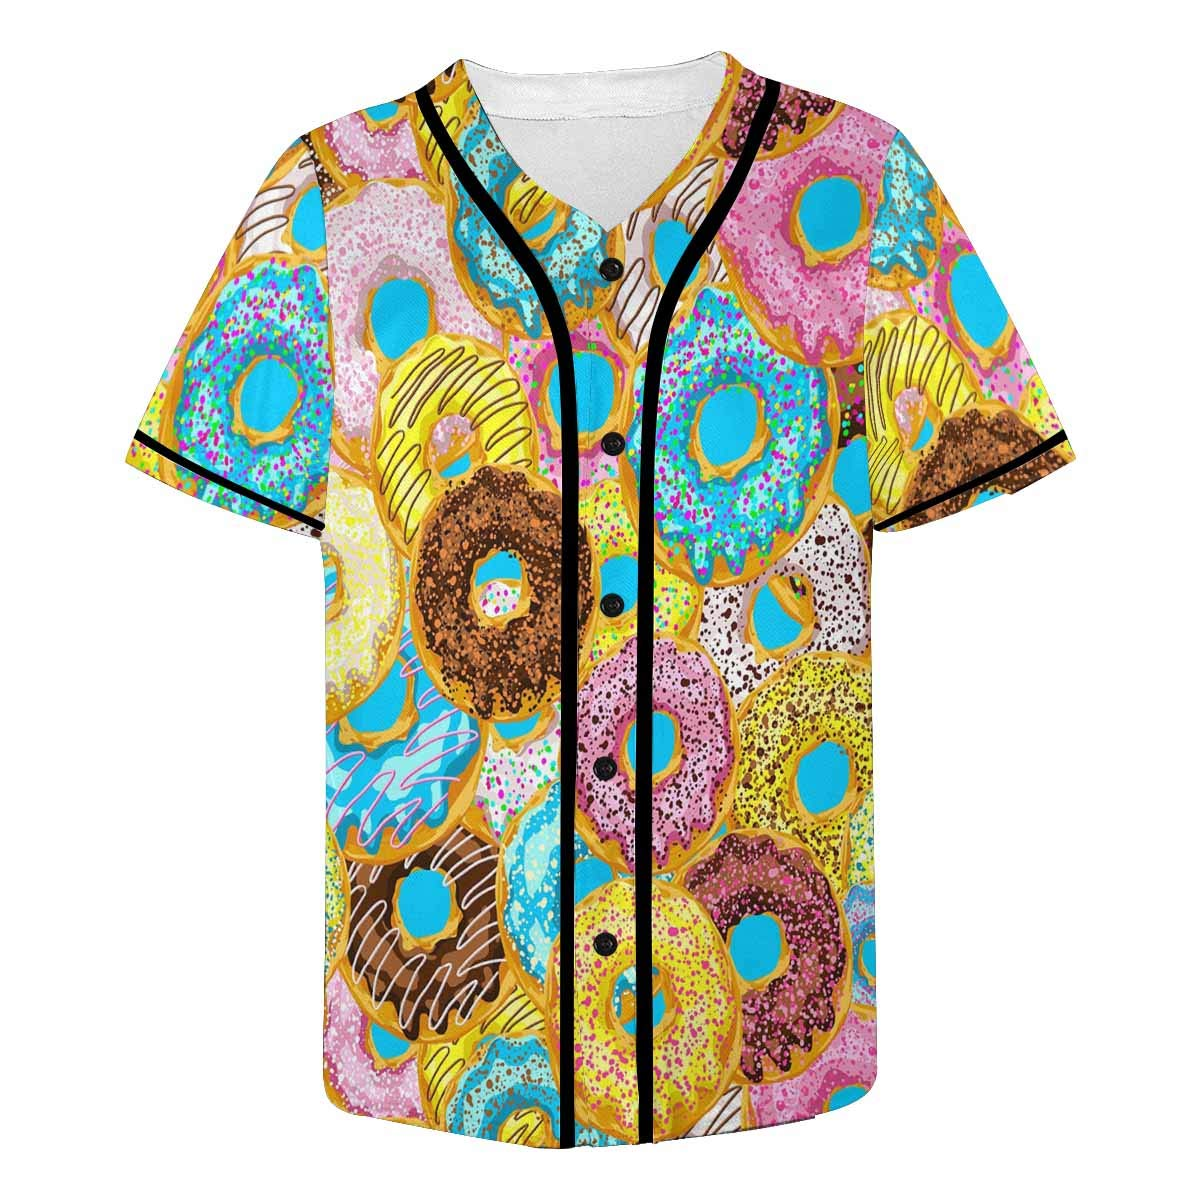 INTERESTPRINT Mens Hipster Short Sleeve Full Button Baseball Jersey Shirts Funny Colorful Donuts Cute Dessert